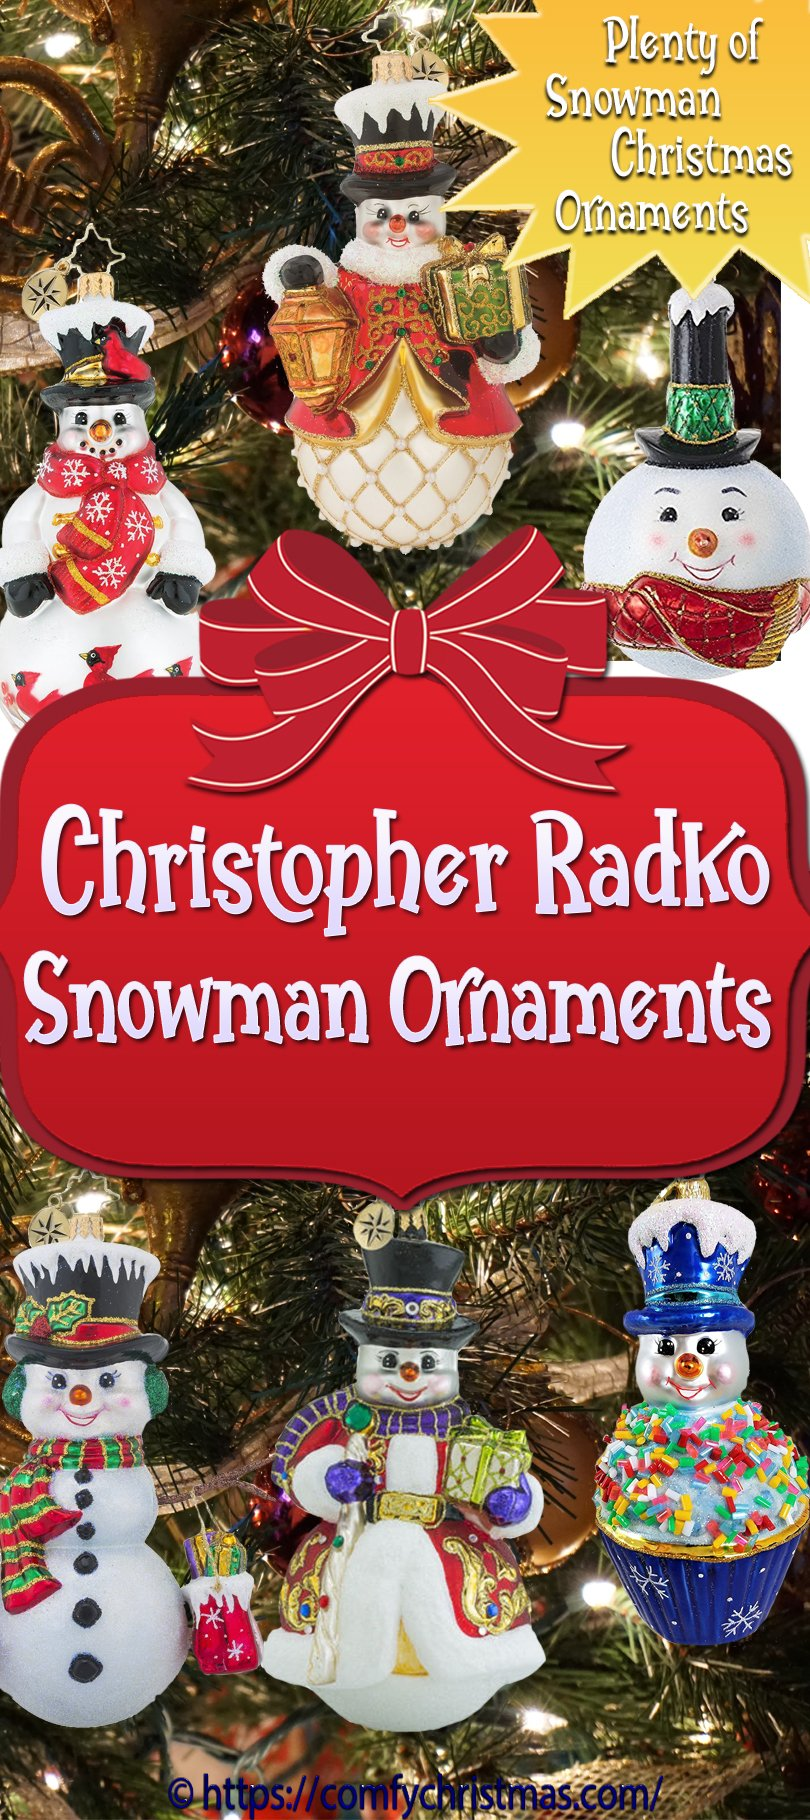 Christopher Radko Snowman Ornament